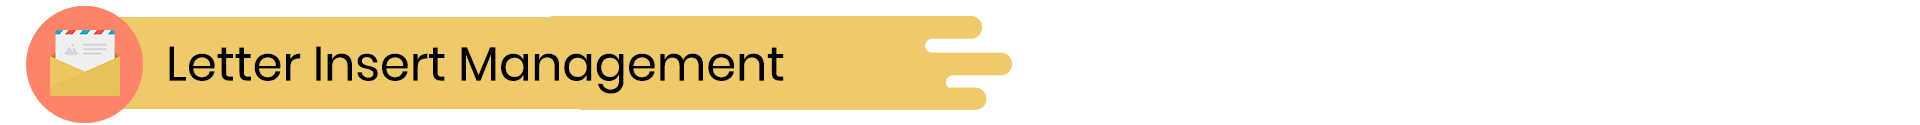 Exact Plus Feature -Letter Insert Management